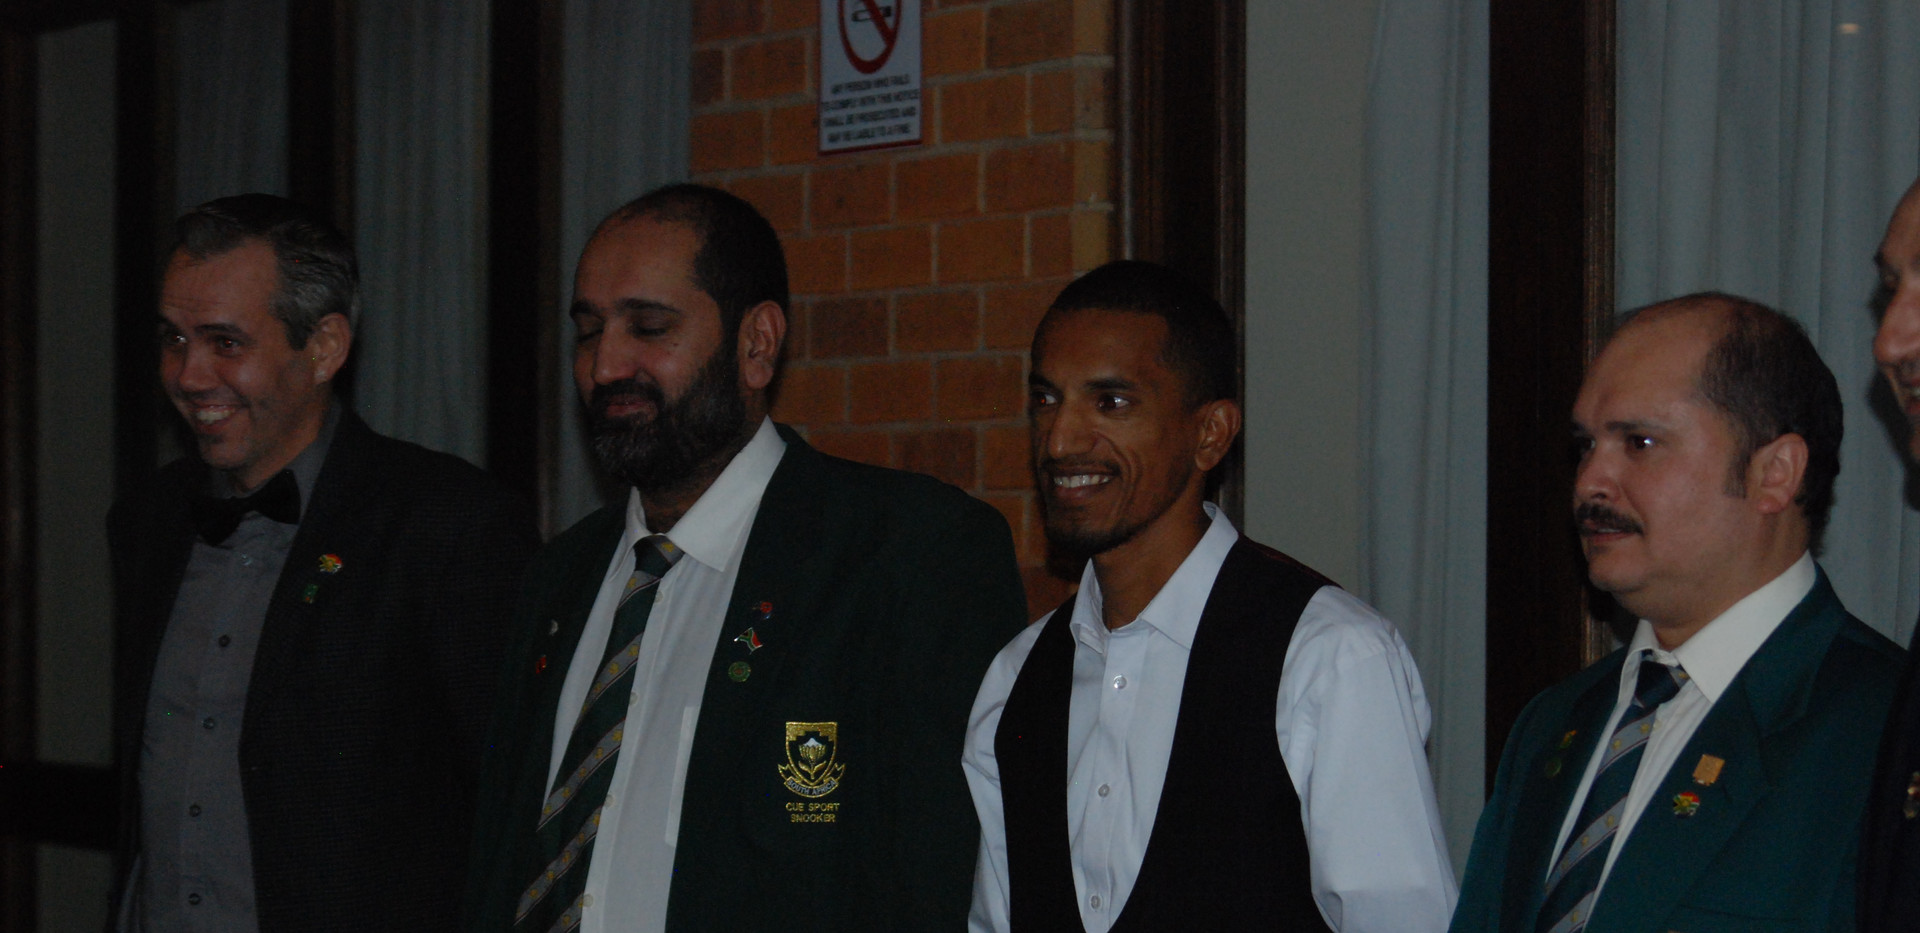 South Africa 2012-33.JPG